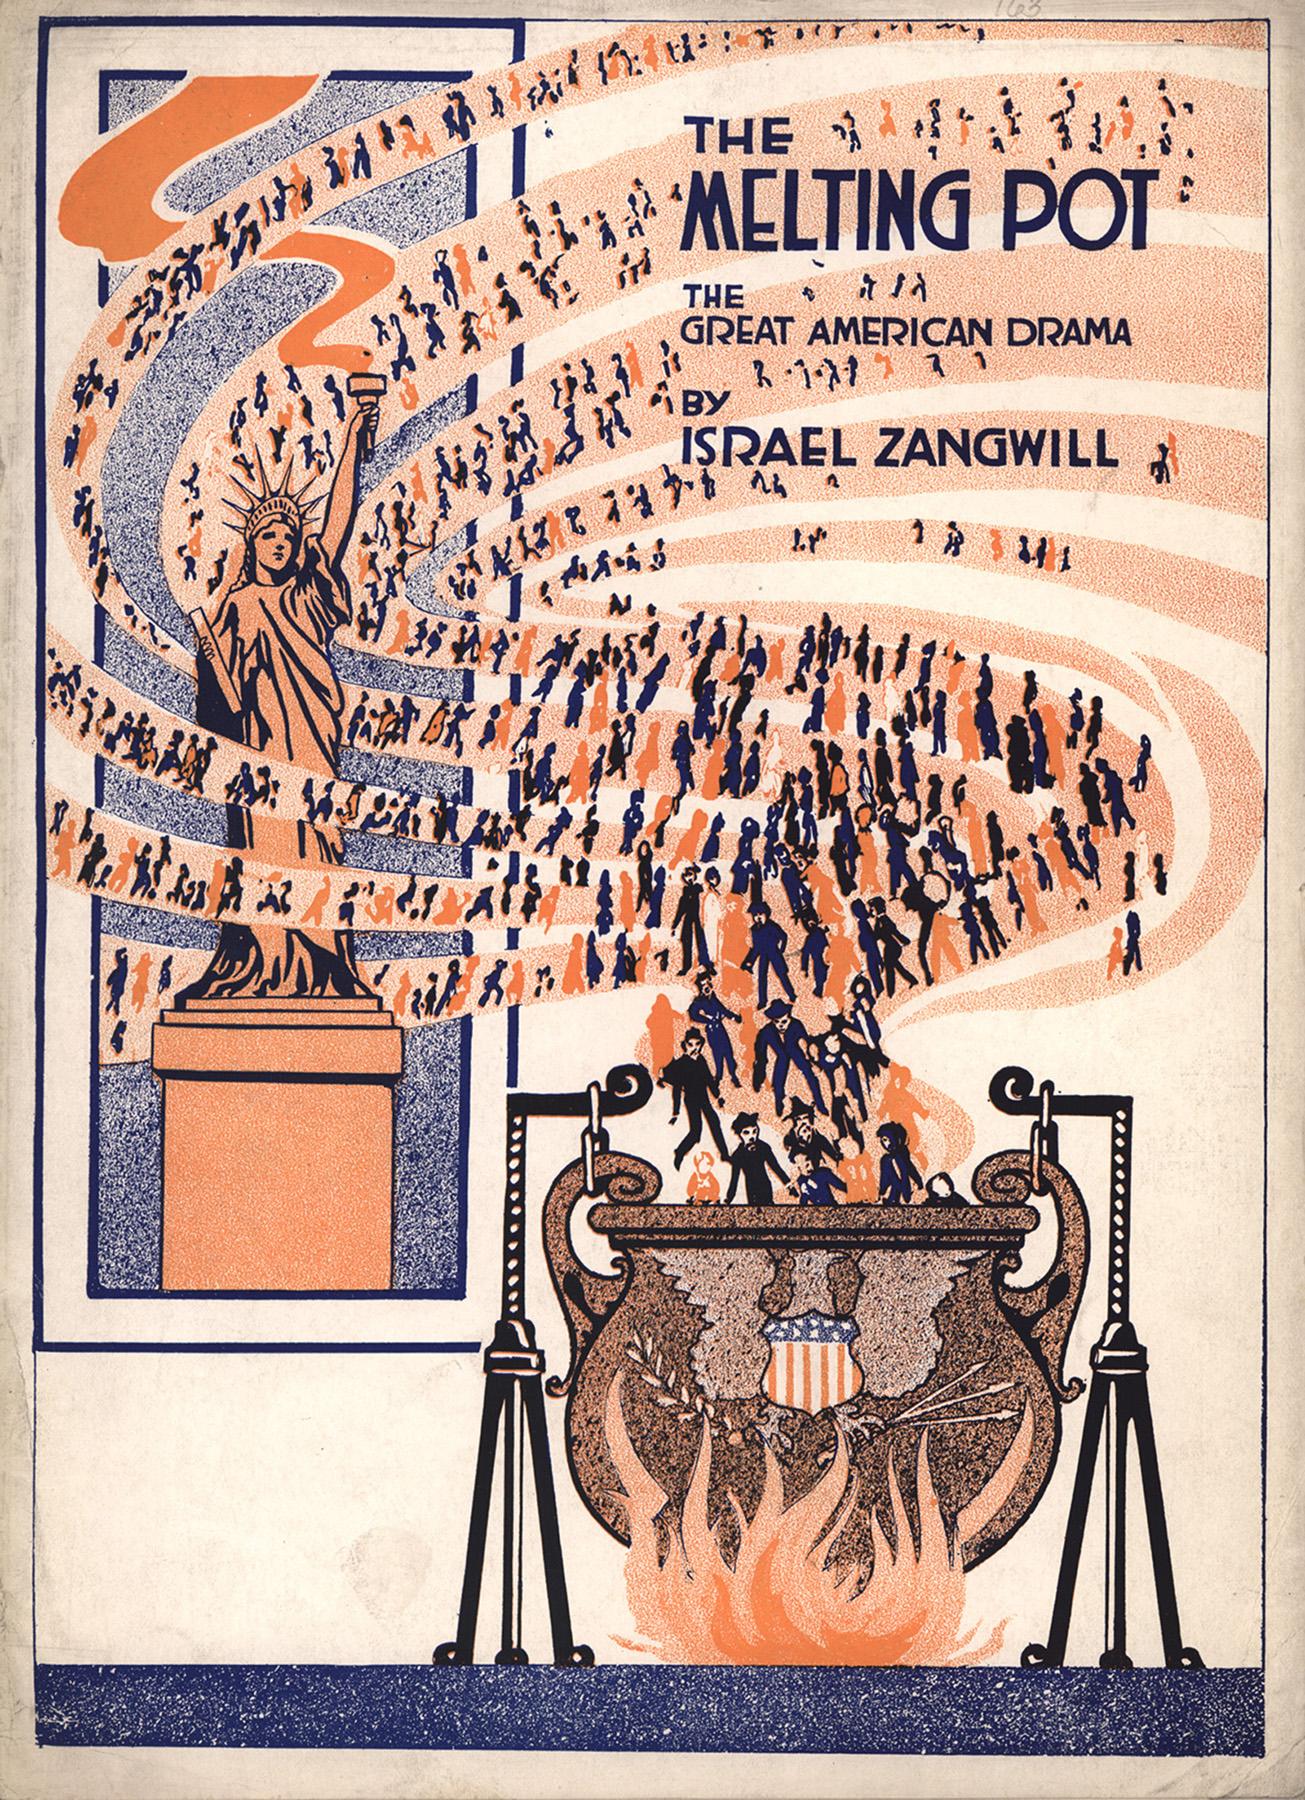 ecologies of theater essays at the century turning Essays 190 📄 805 periodicals ecologies of theater: essays at the century turning (paj books) samuel beckett (5) theater studies (6) theatre (102) theatre.